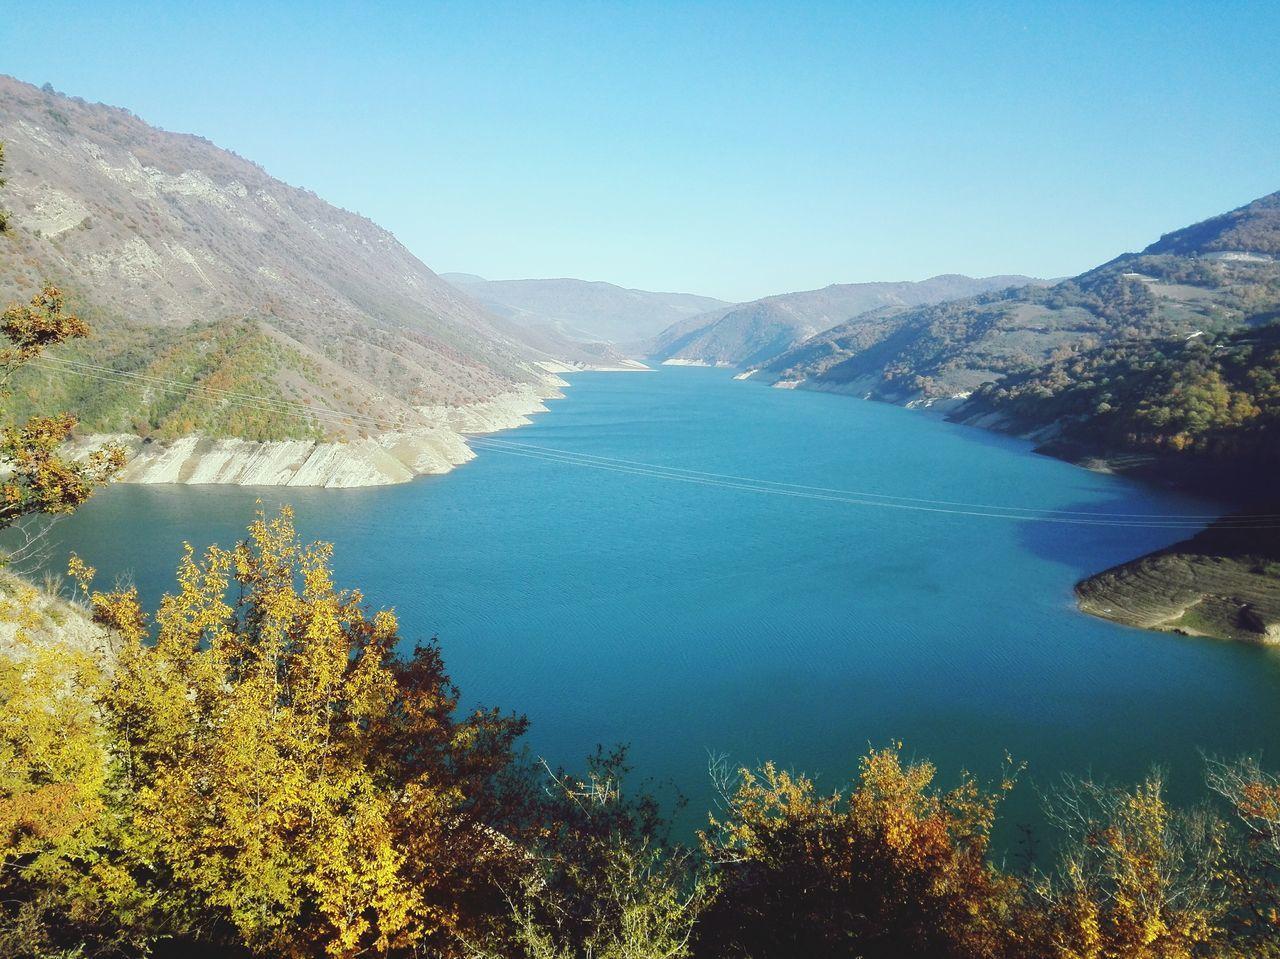 Landscape Nature Nature Art Colorfull View Water Blue Yellow Autumn Autumn Colors Iran Mazandaran Irantravel